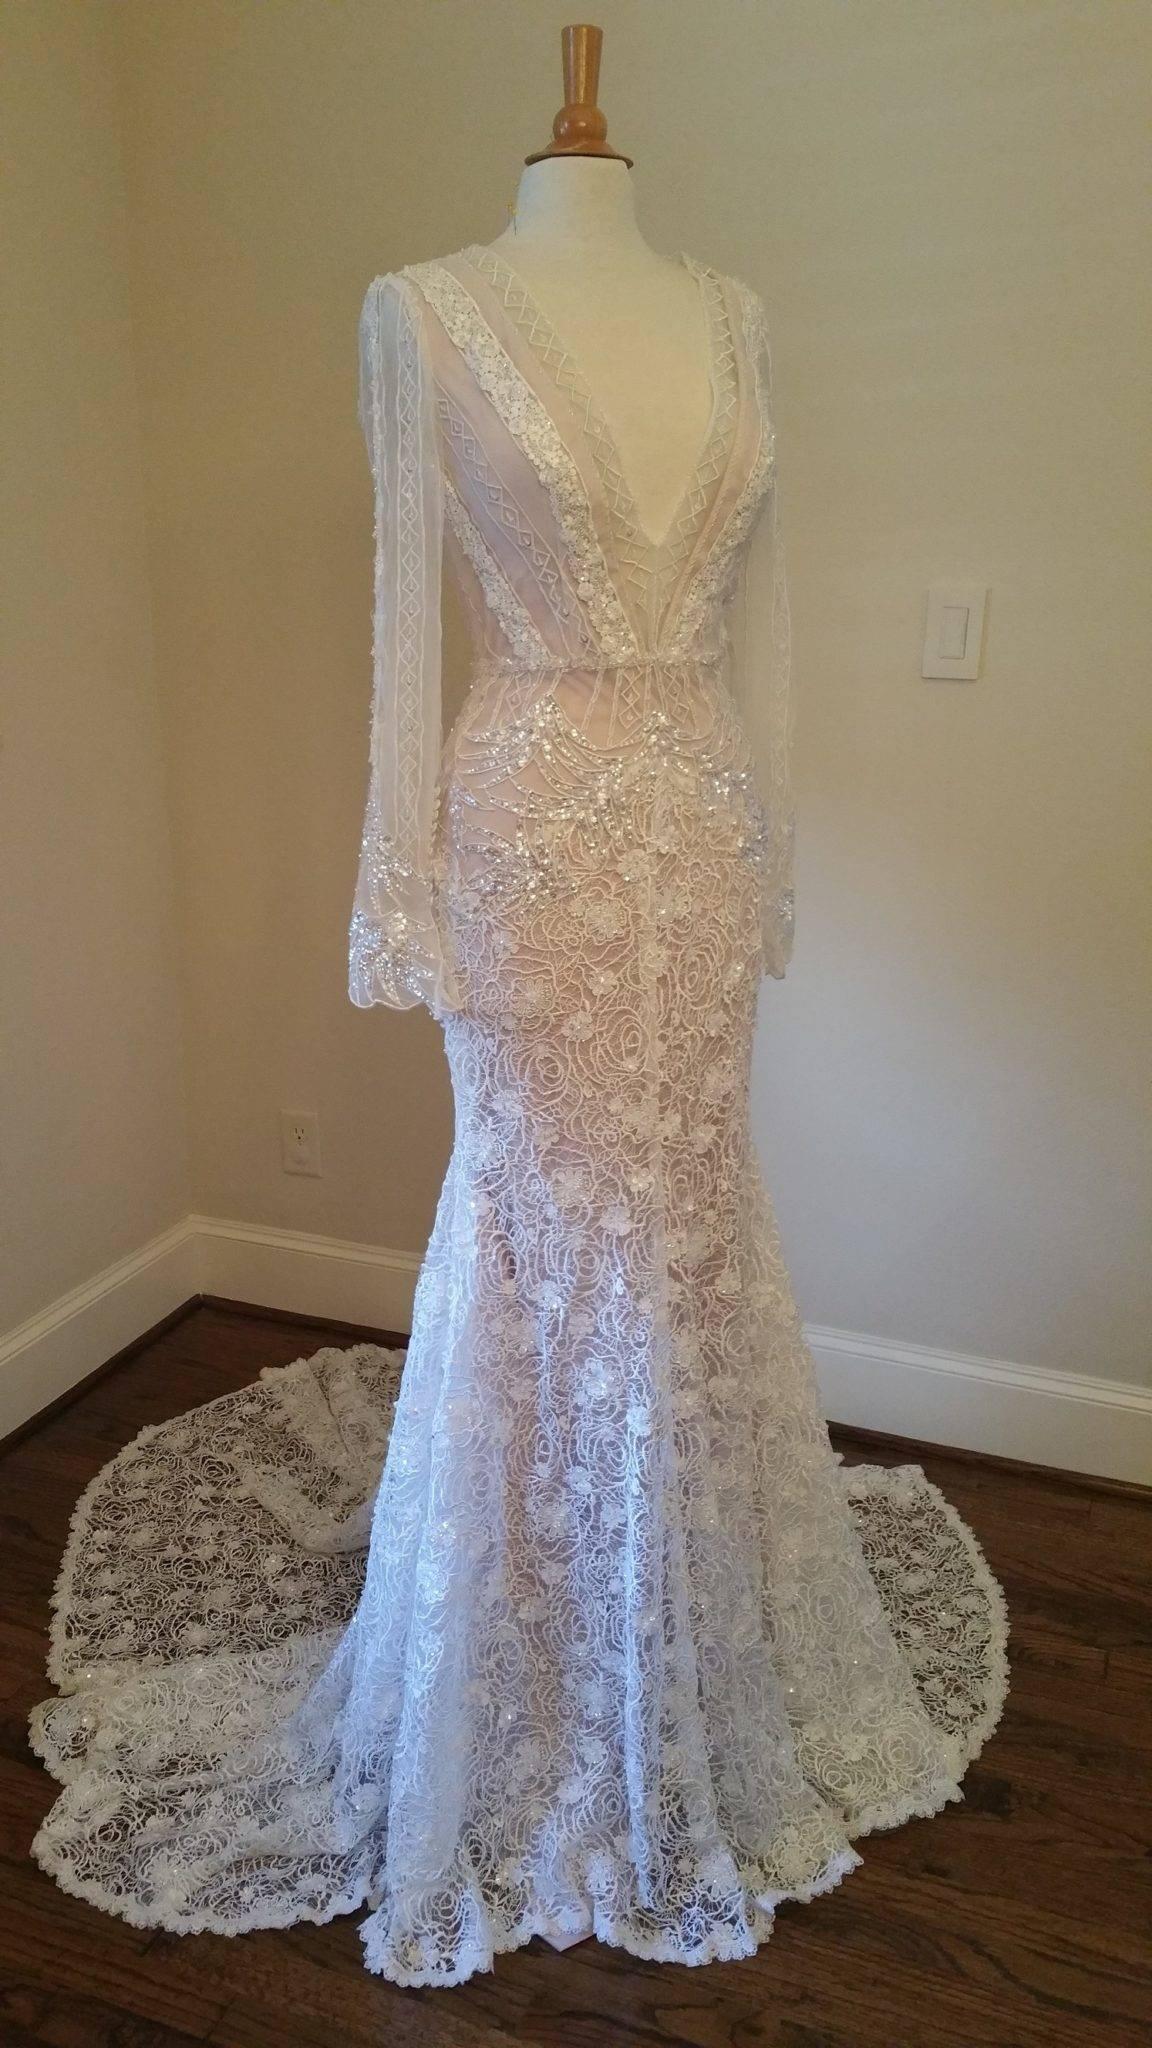 V-neck Long Sleeve Wedding Dresses Inspired by Inbal Dror